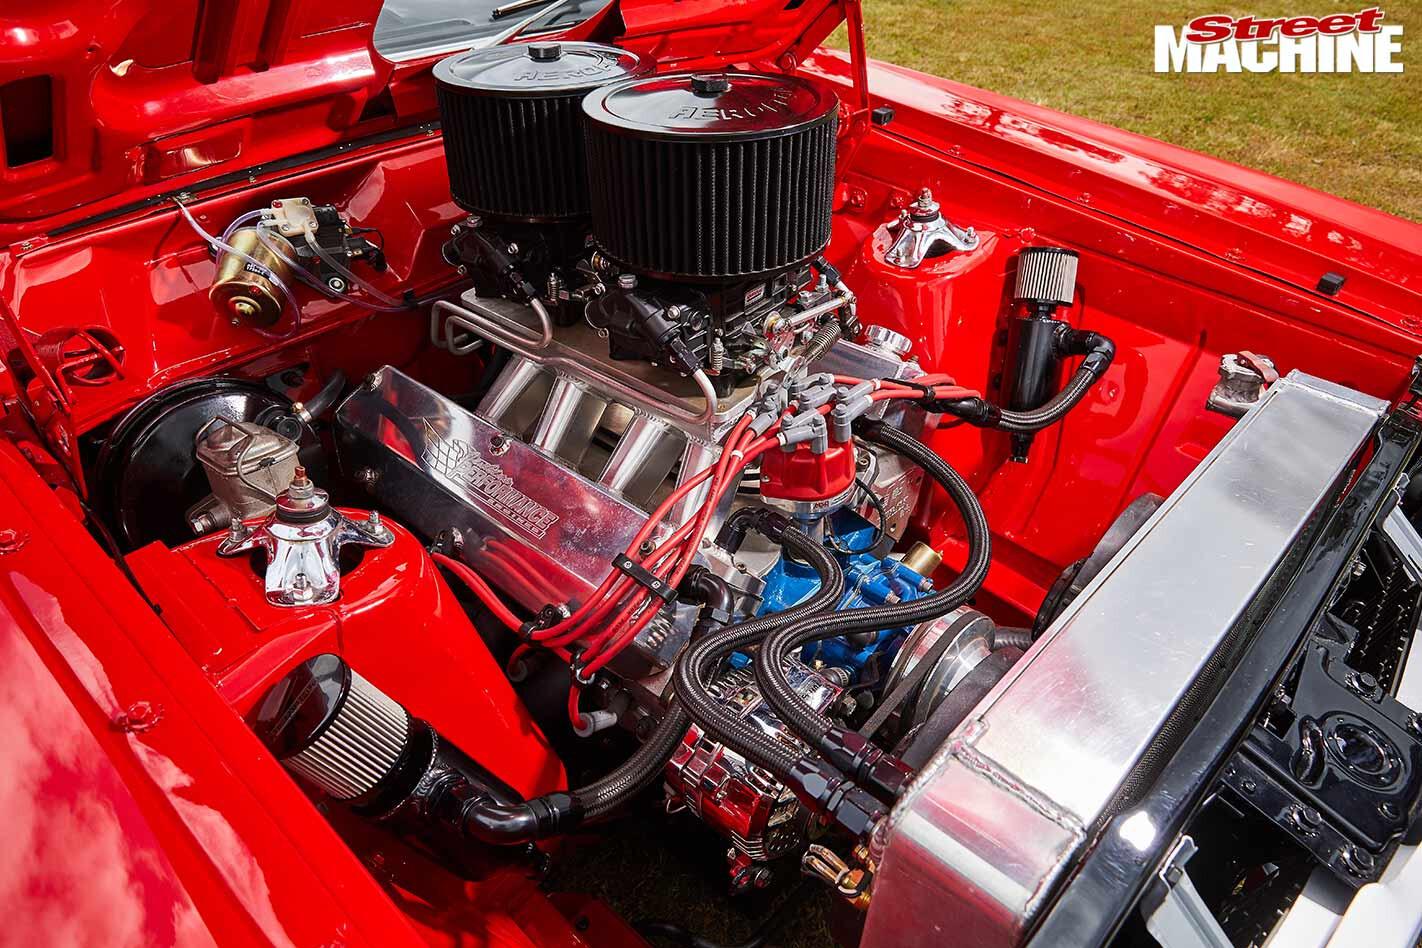 Ford Falcon XY GS engine bay